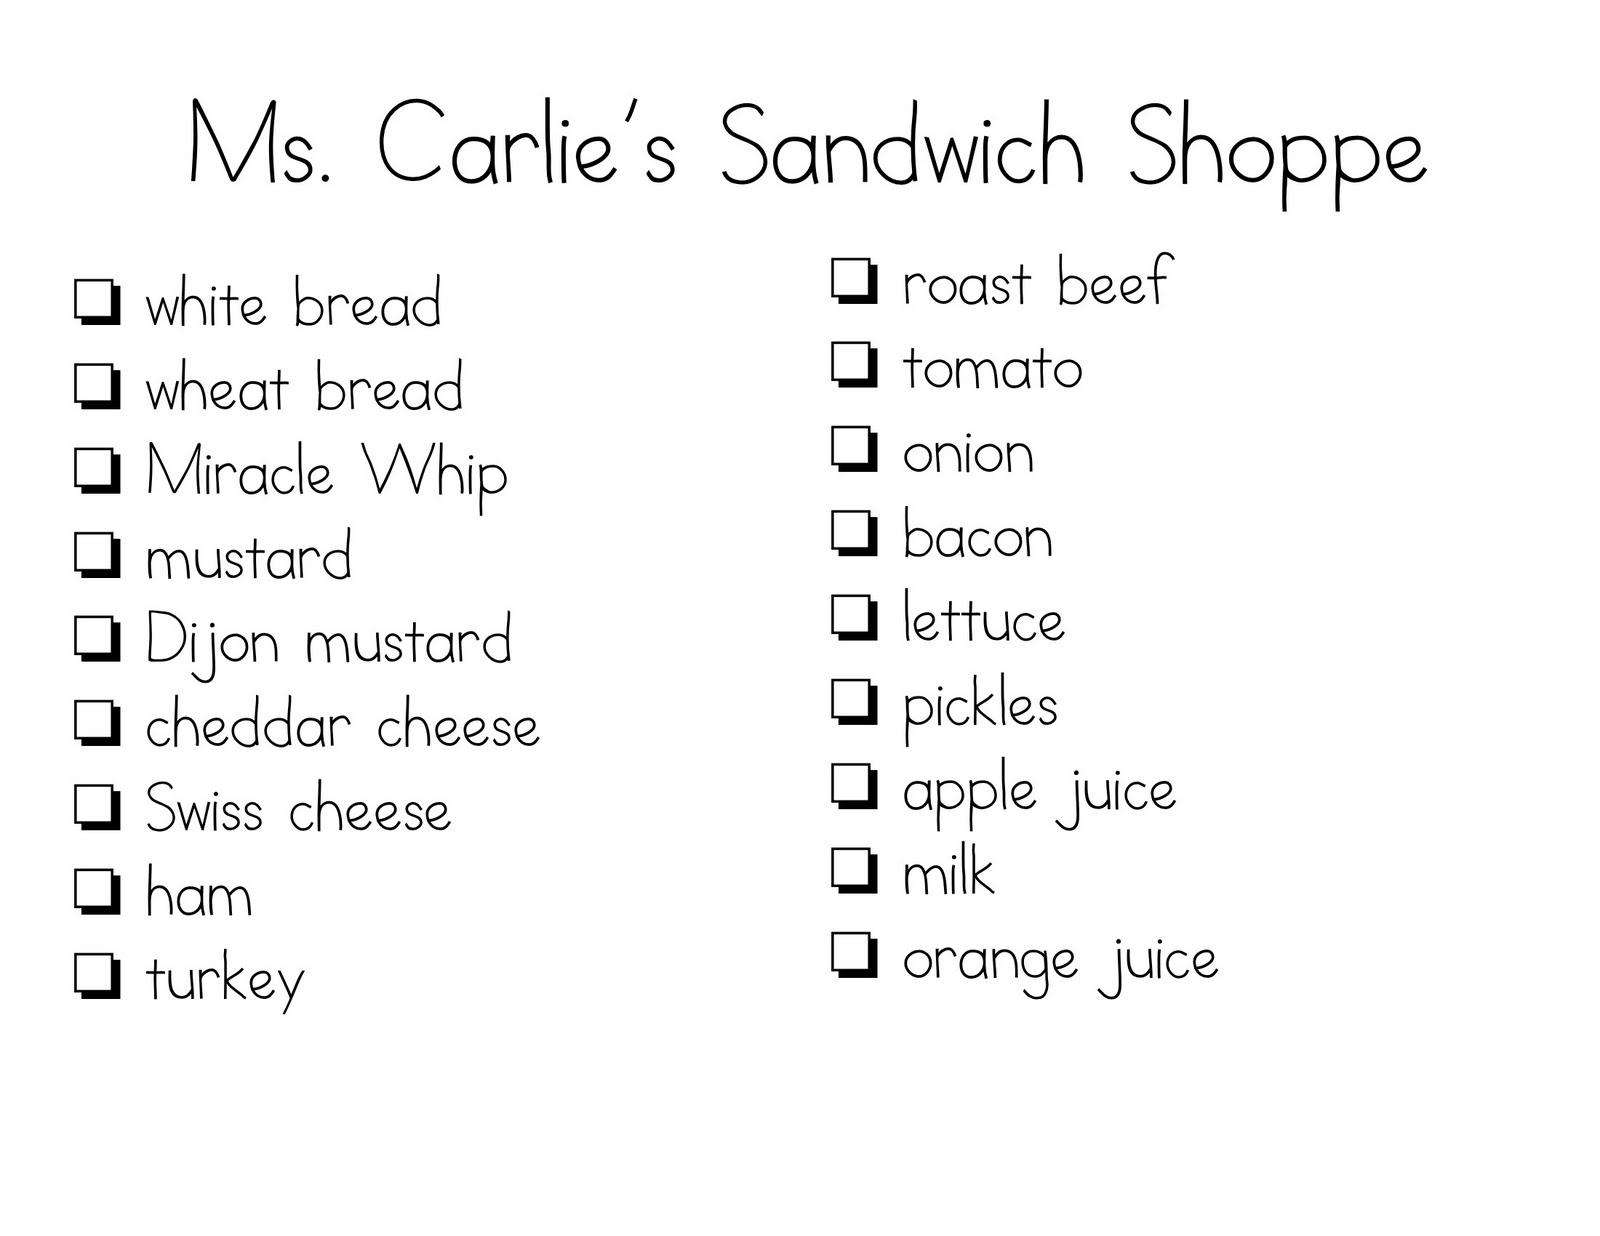 sandwich order form template - Heart.impulsar.co